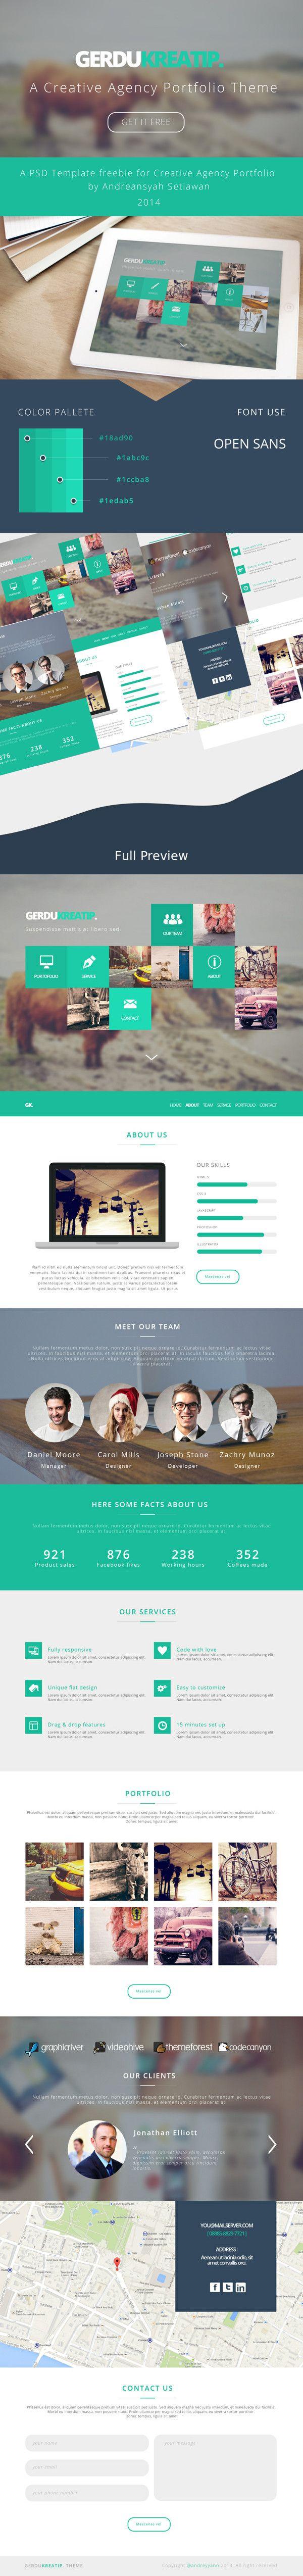 GerduKreatip: Agency Portfolio Theme | Branding, Editorial y ...